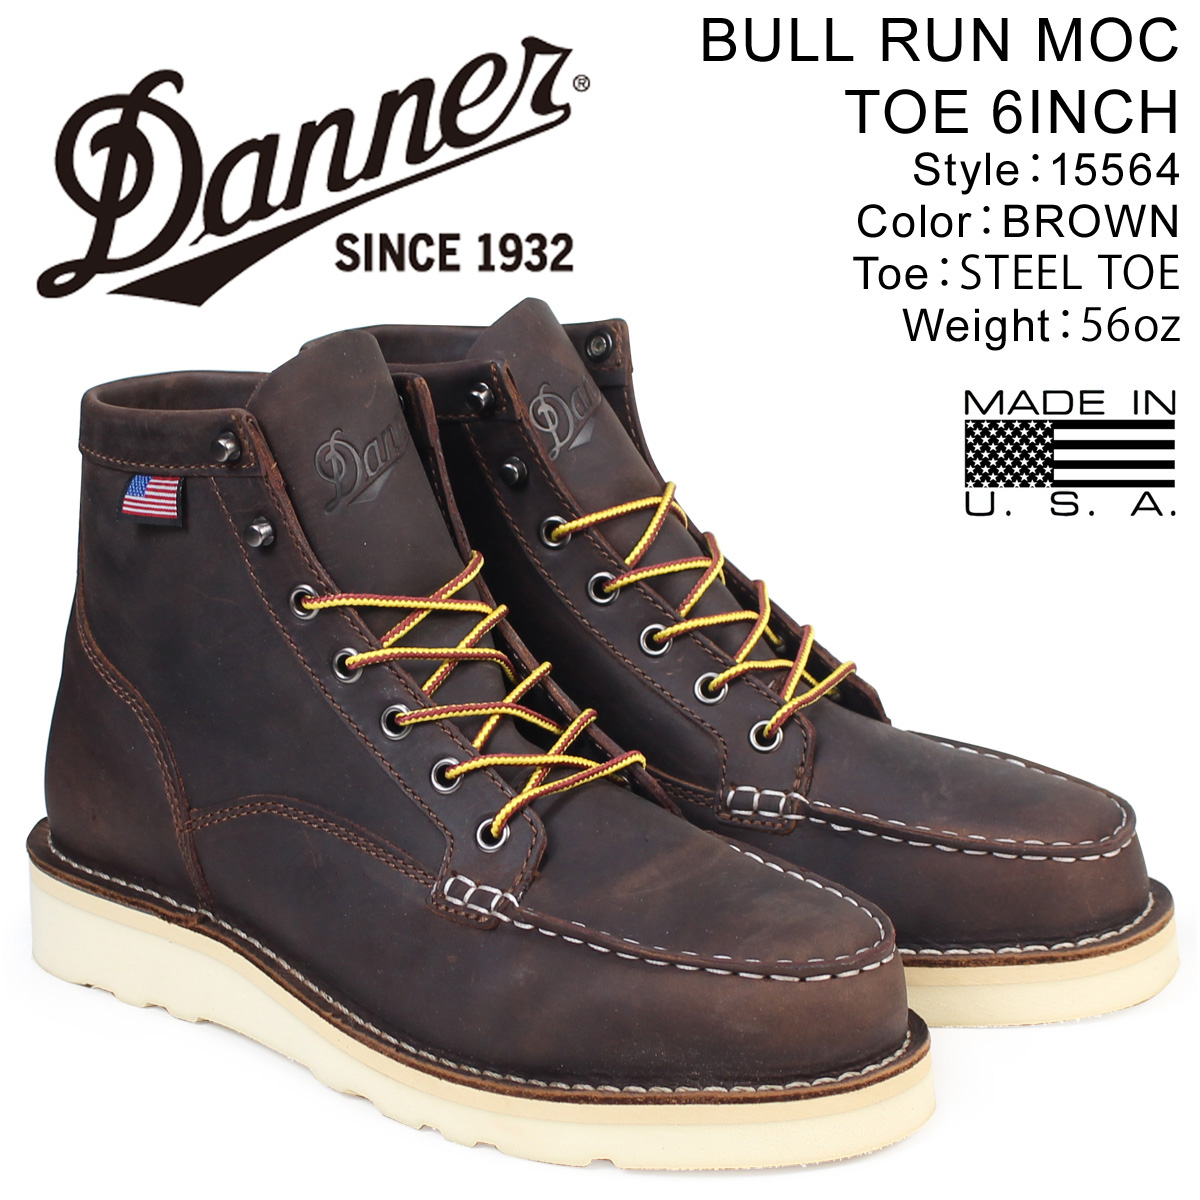 0cefafc848d Danner boots Danner BULL RUN MOC TOE 6INCH 15564 D Wise men brown